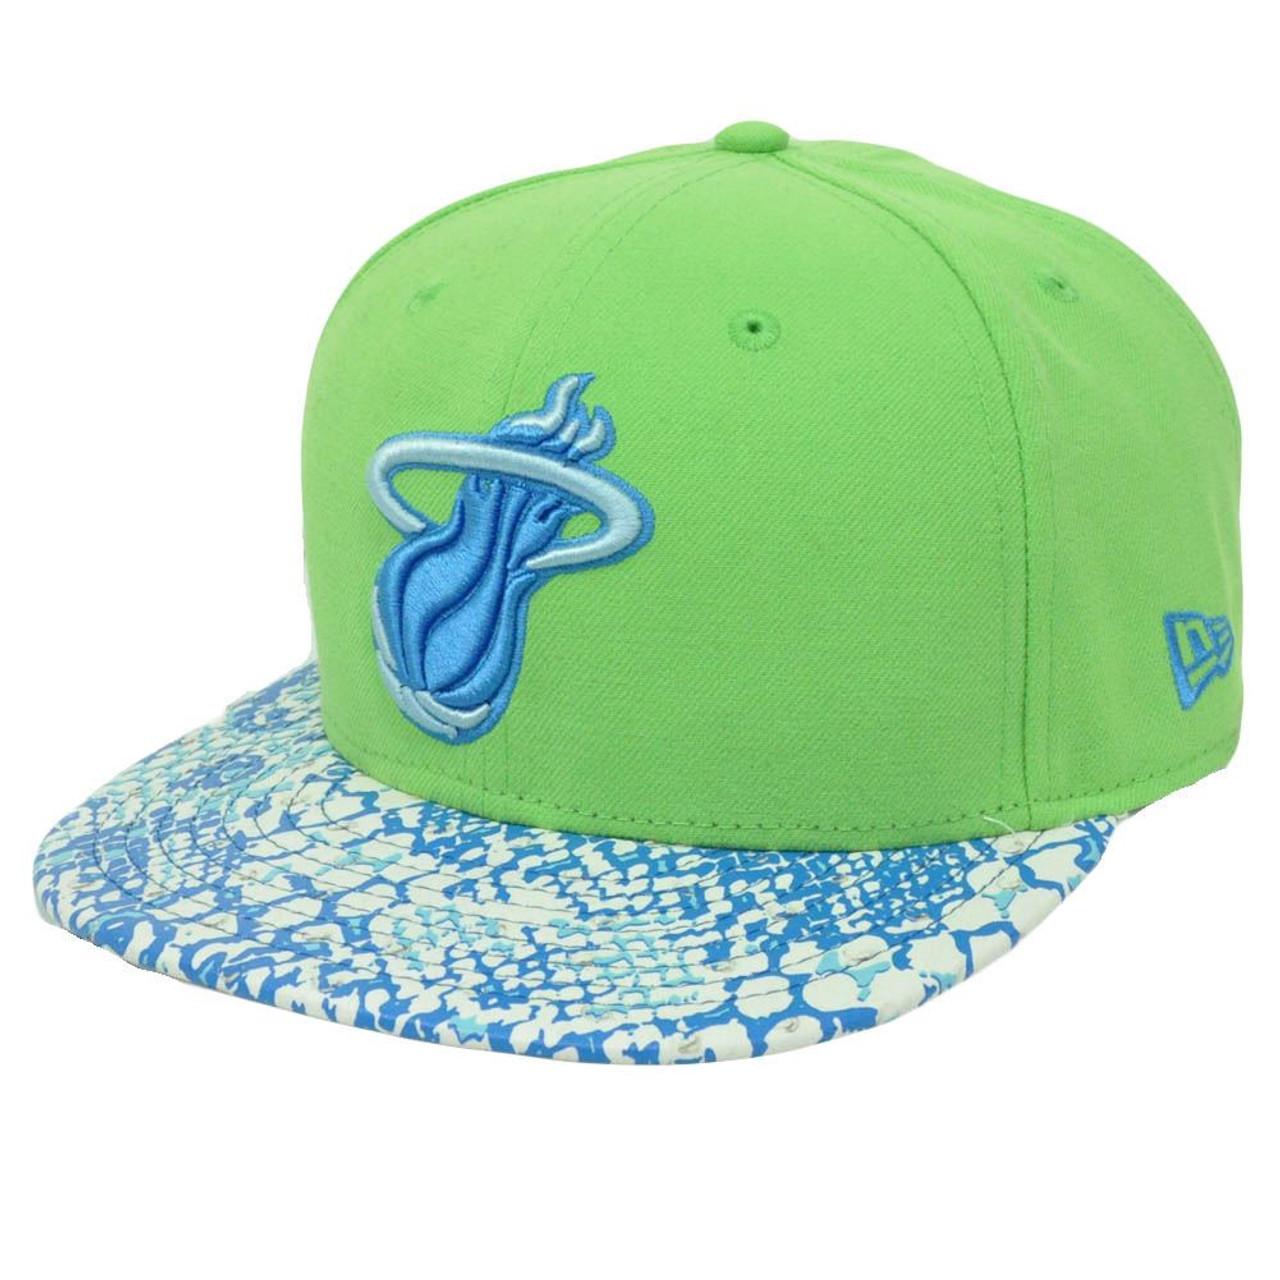 new product 5c1cd e72ef NBA New Era 9Fifty Miami Heat Ostrich Vize Snake Strapback Flat Brim M L Hat